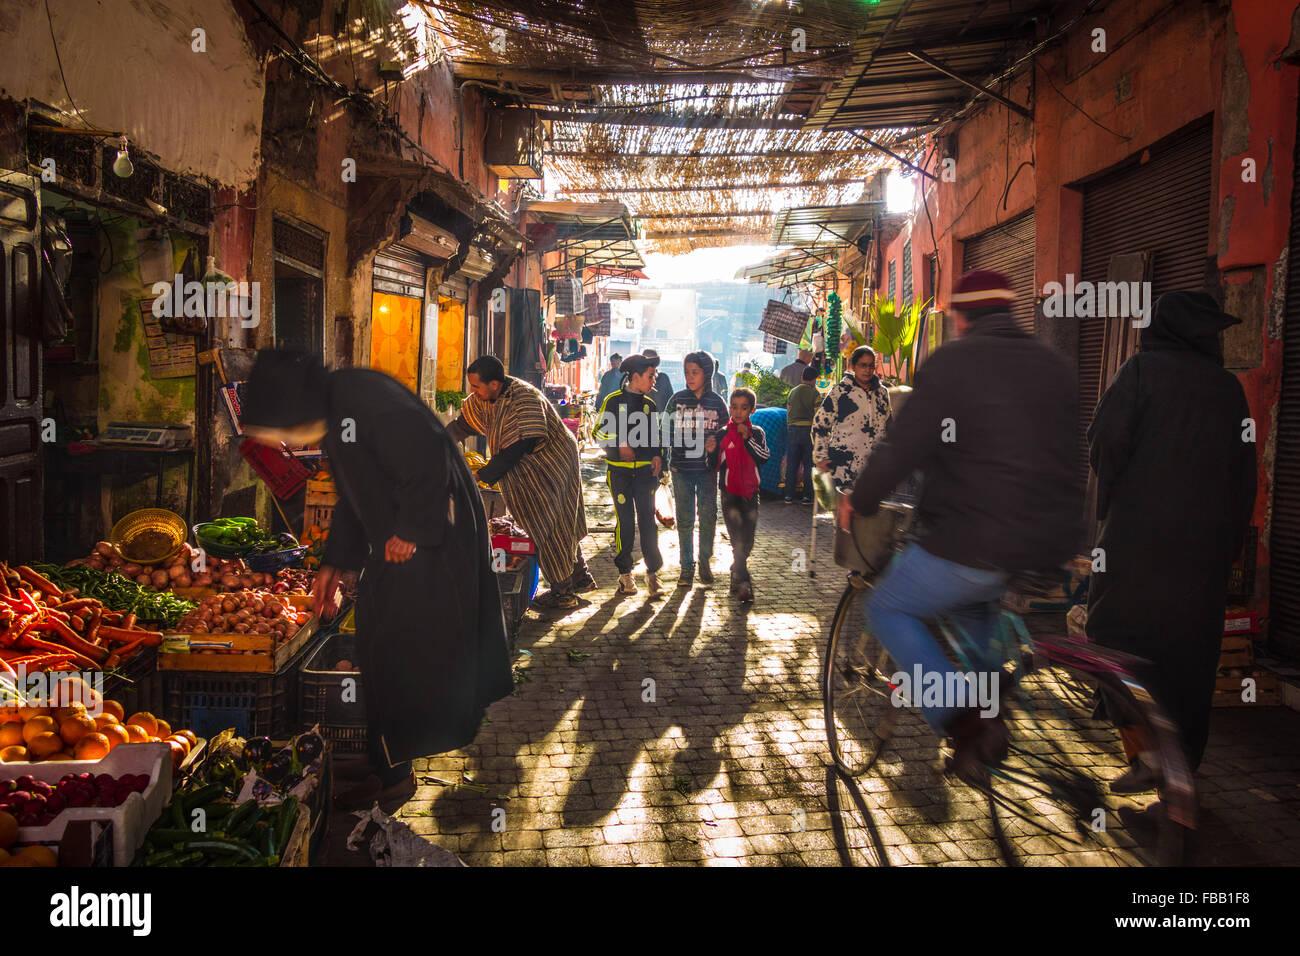 Street life Marrakech Medina - Stock Image